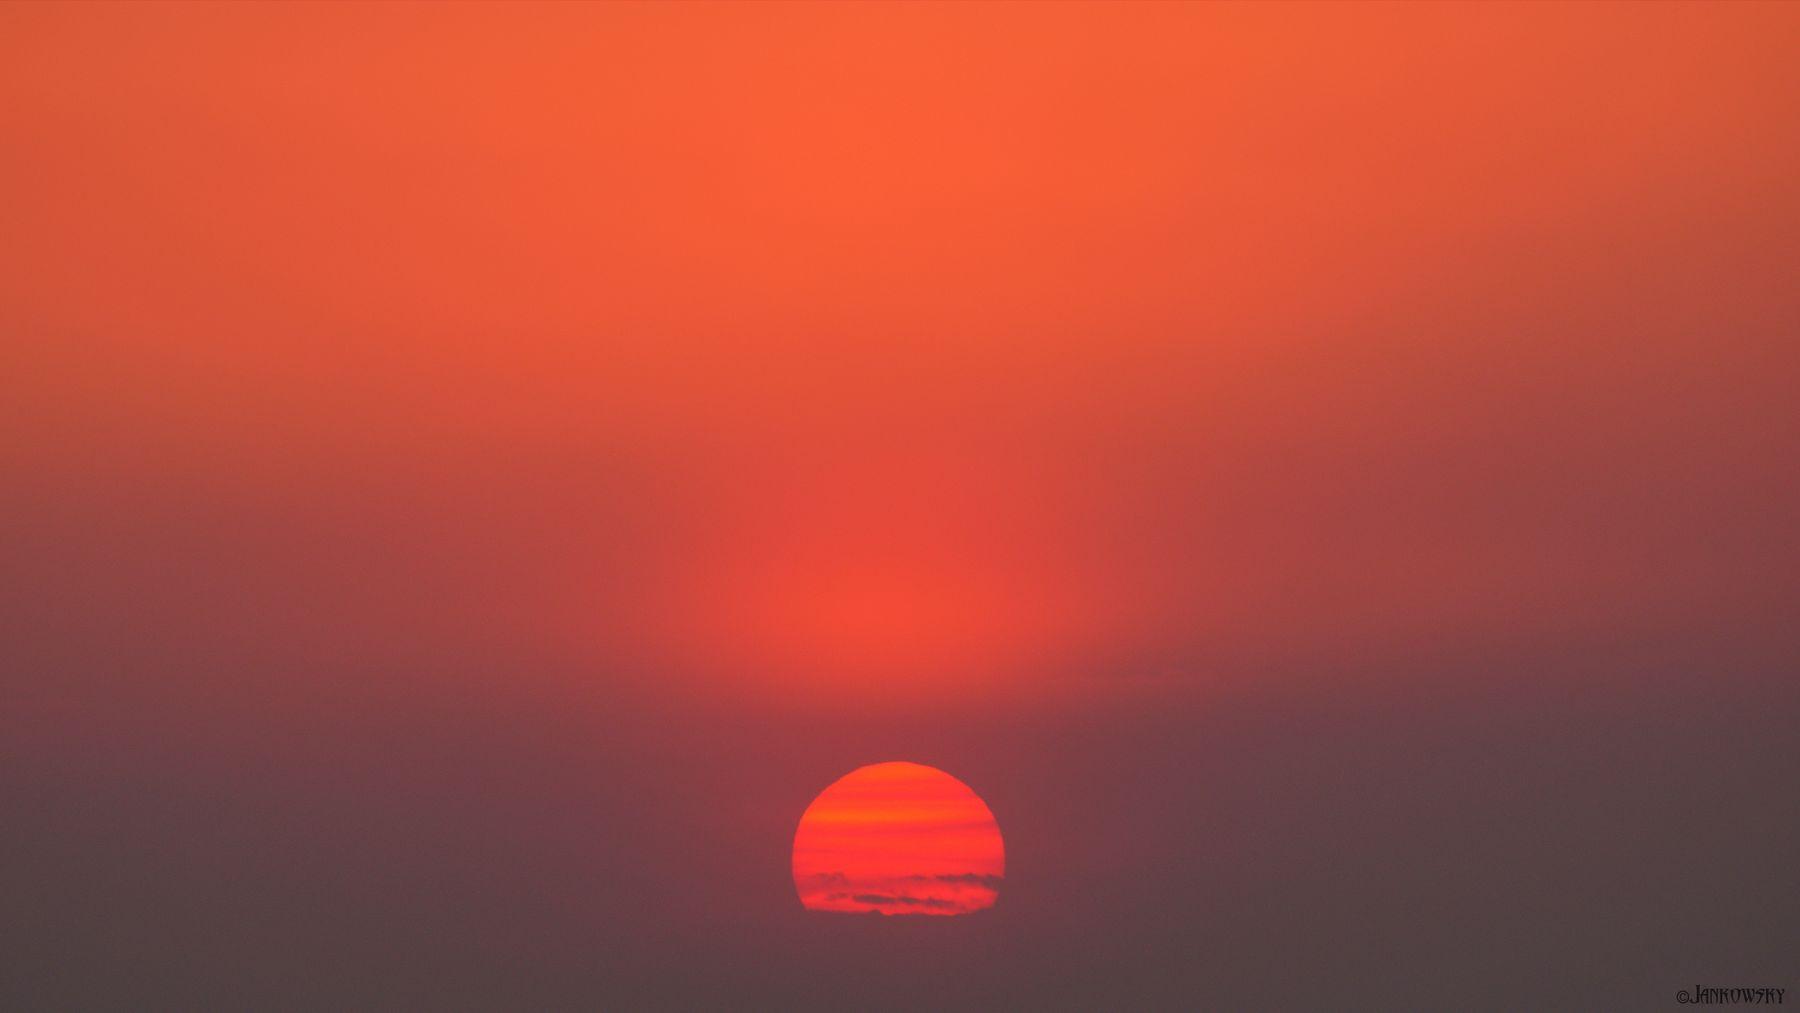 Sunshine Gradient пекло градиент розовое небо закат омск canon fd 300mm F2.8l